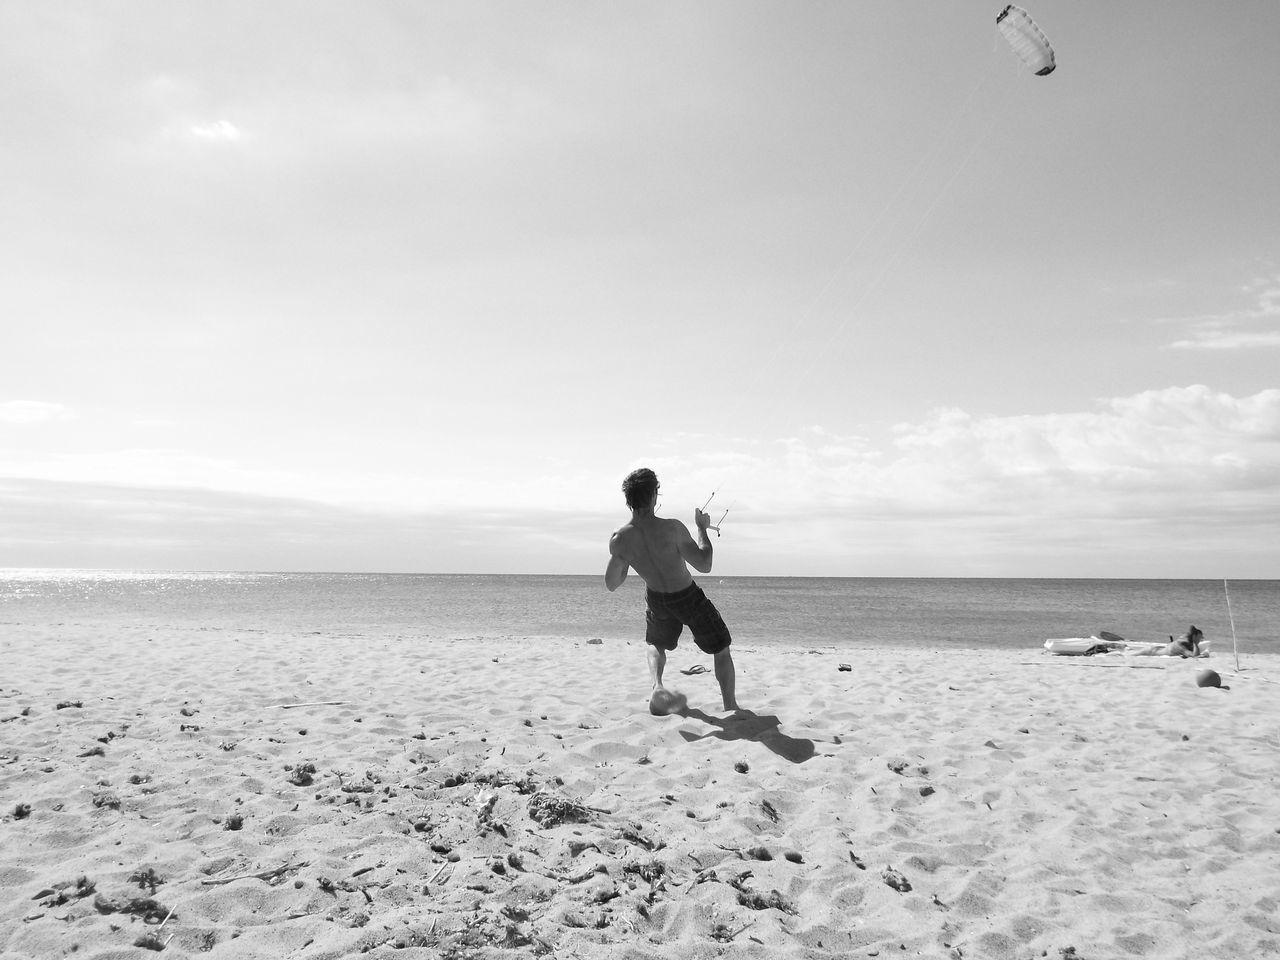 Beautiful stock photos of schwarz weiß, sea, beach, horizon over water, full length